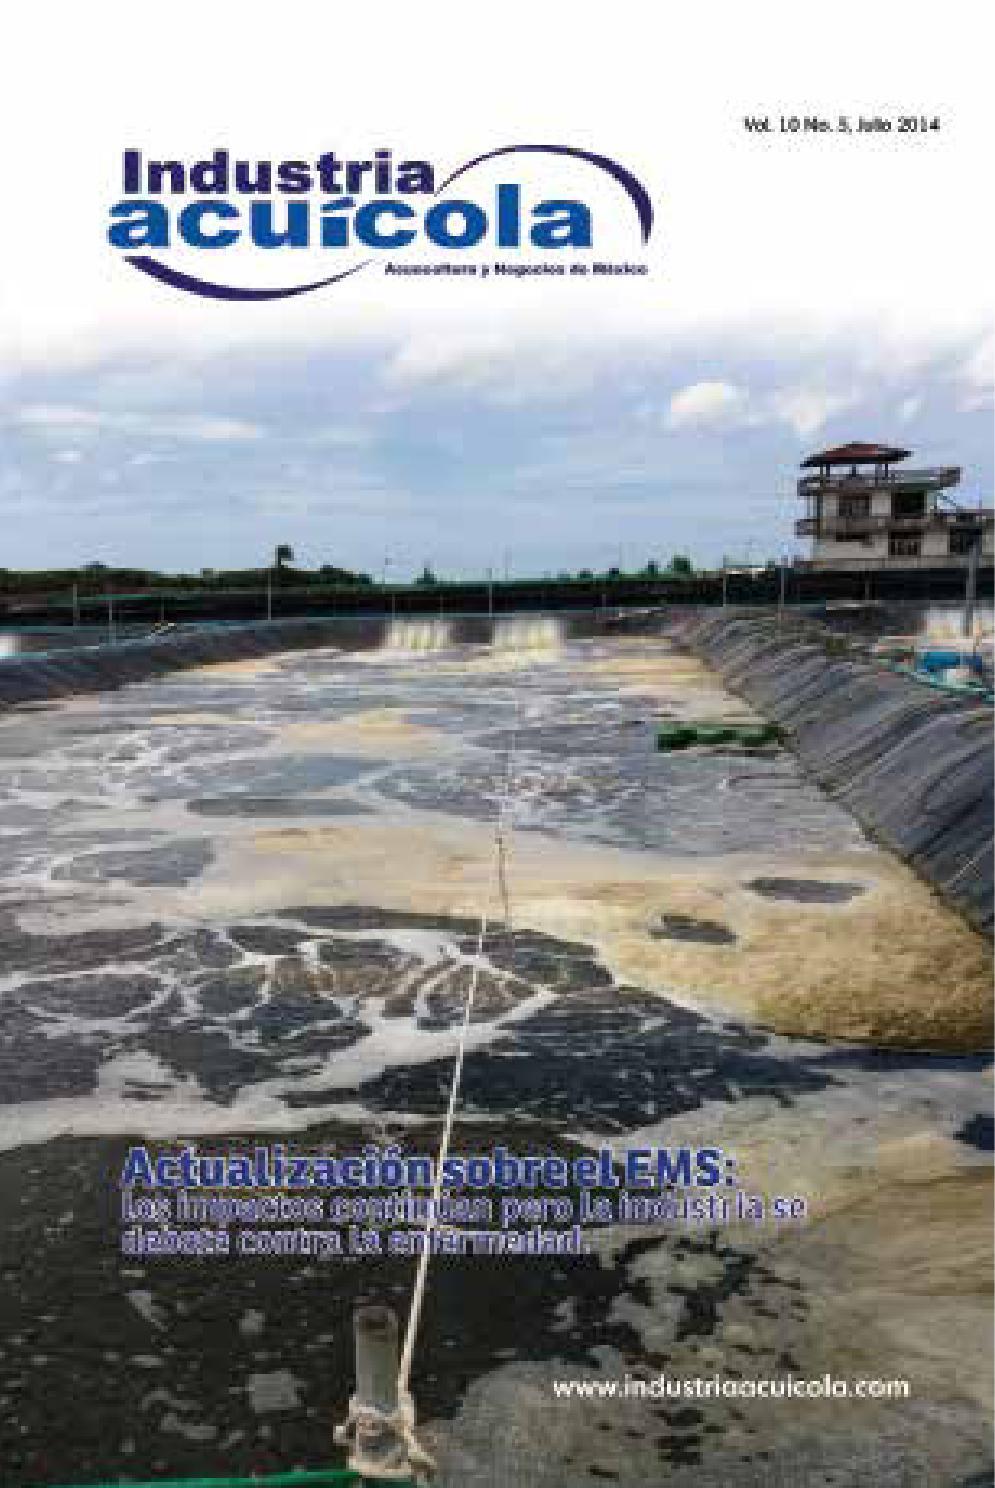 Industria acu cola edici n 10 5 by aqua negocios sa de cv for Precio de estanques de geomembrana para peces